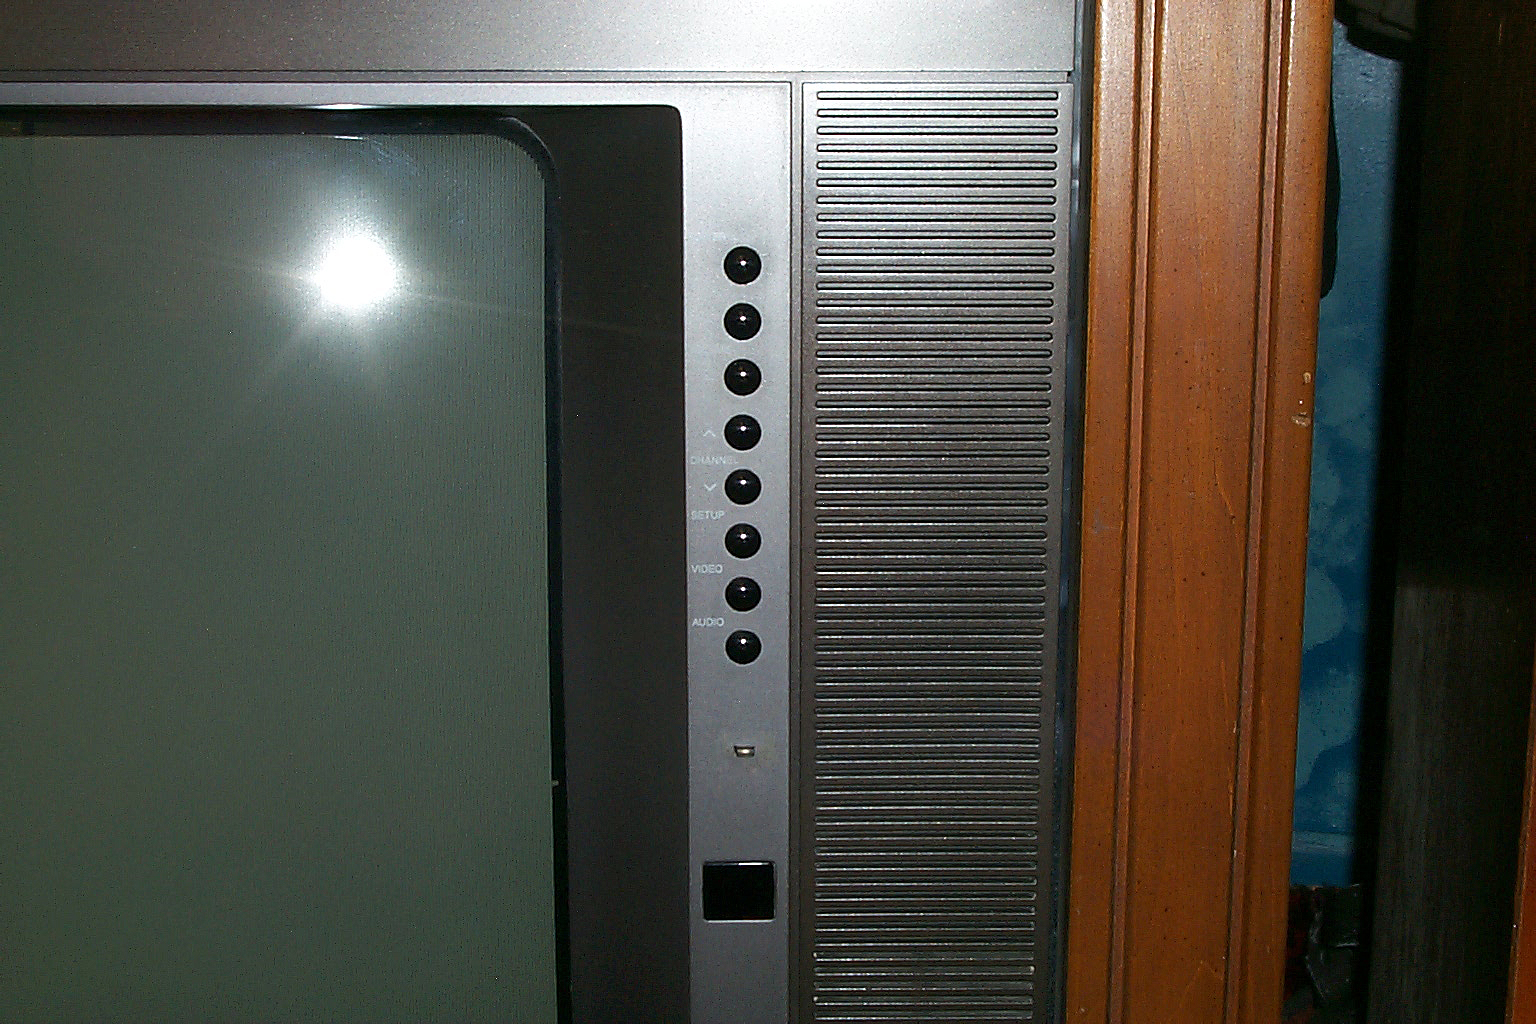 Helpful Tech Repair  1991 Rca 25 Inch Cabinet Tv Review